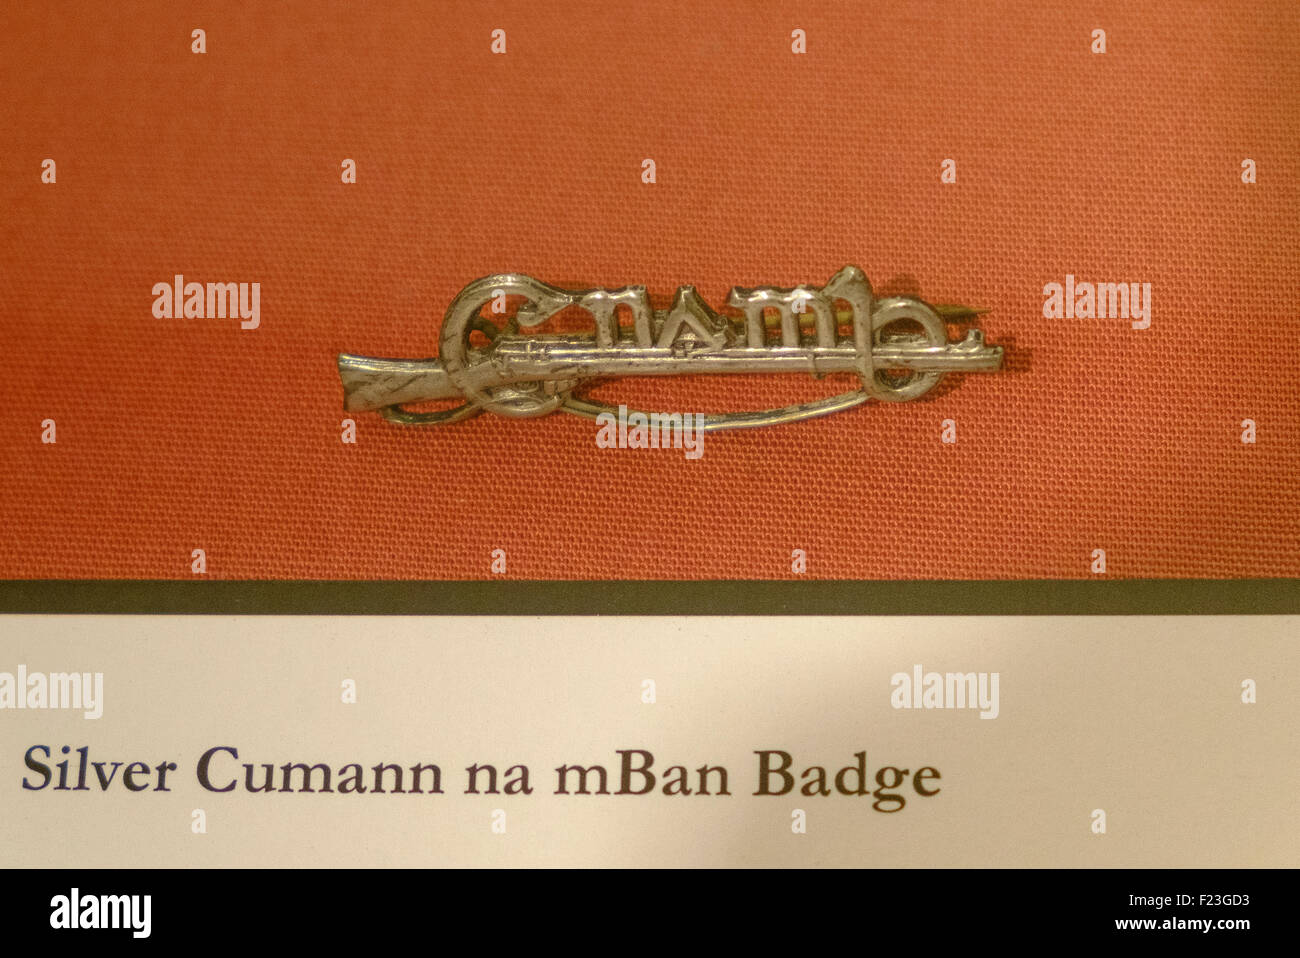 silver cumann na mBan badge irish fenian army - Stock Image